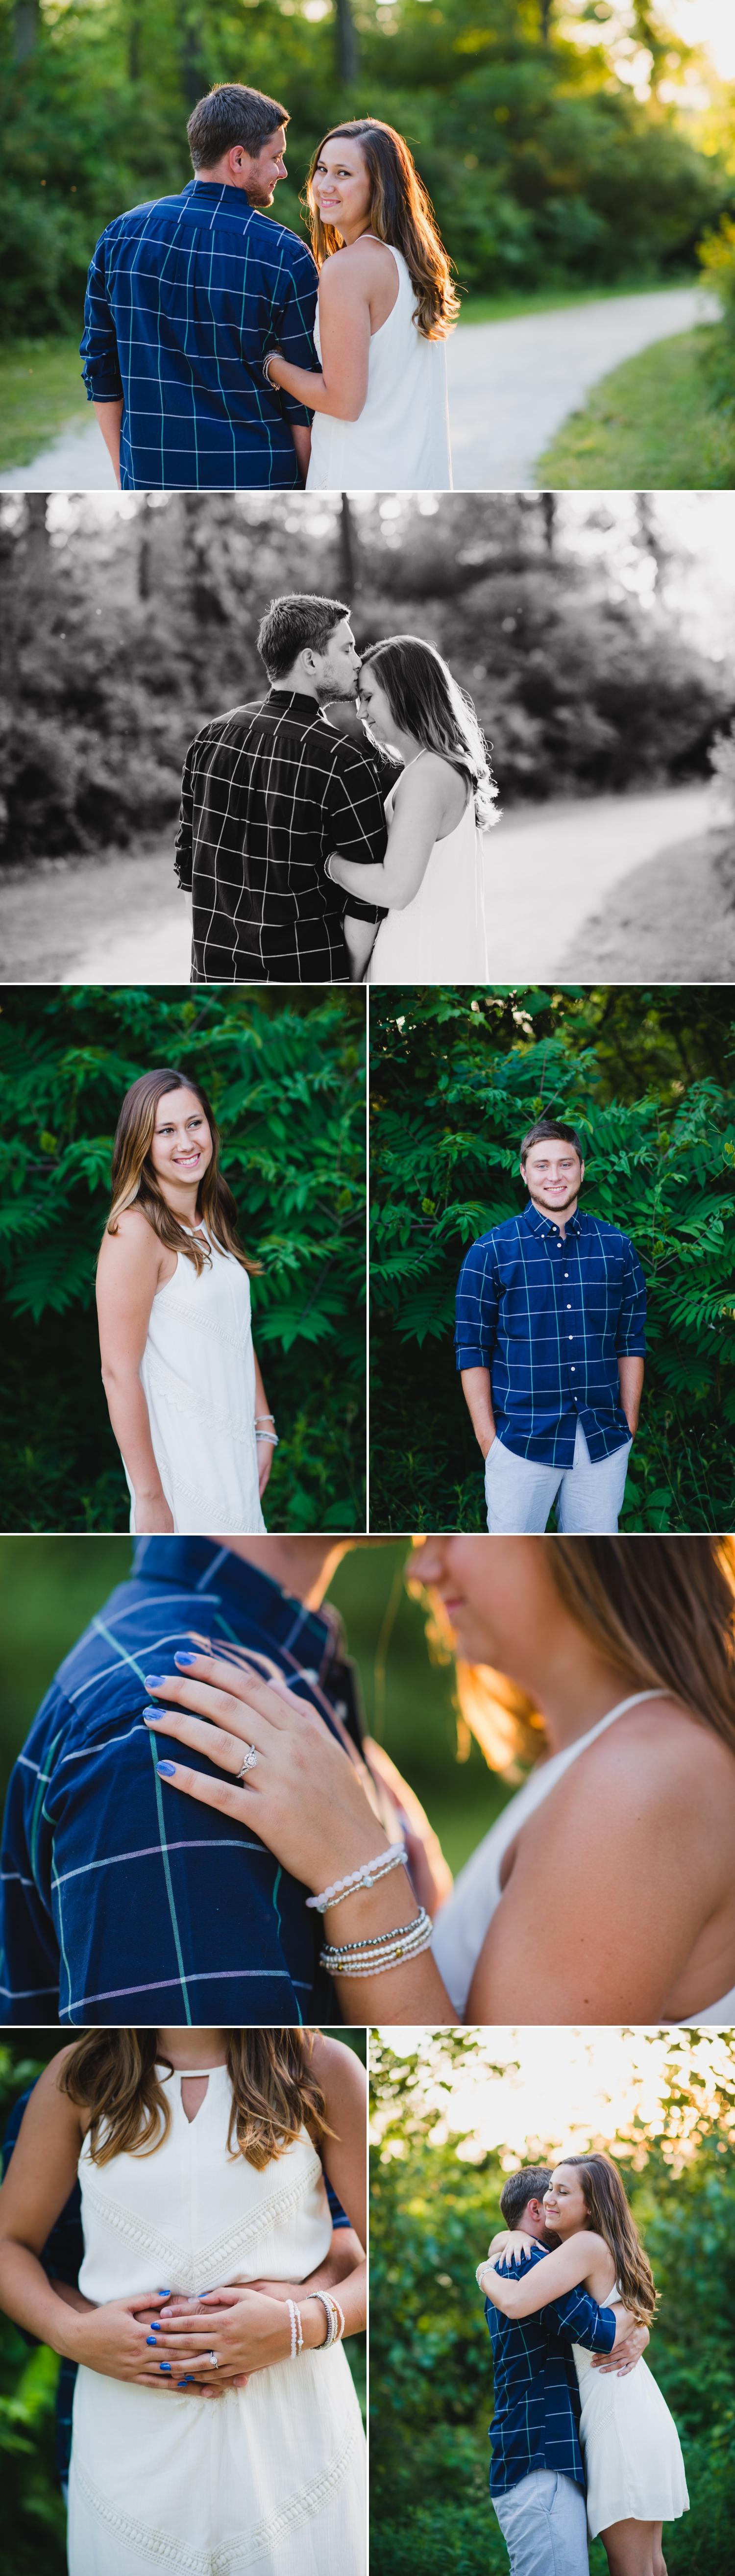 Lauren and Brian Canton Ohio Engagement 4.jpg